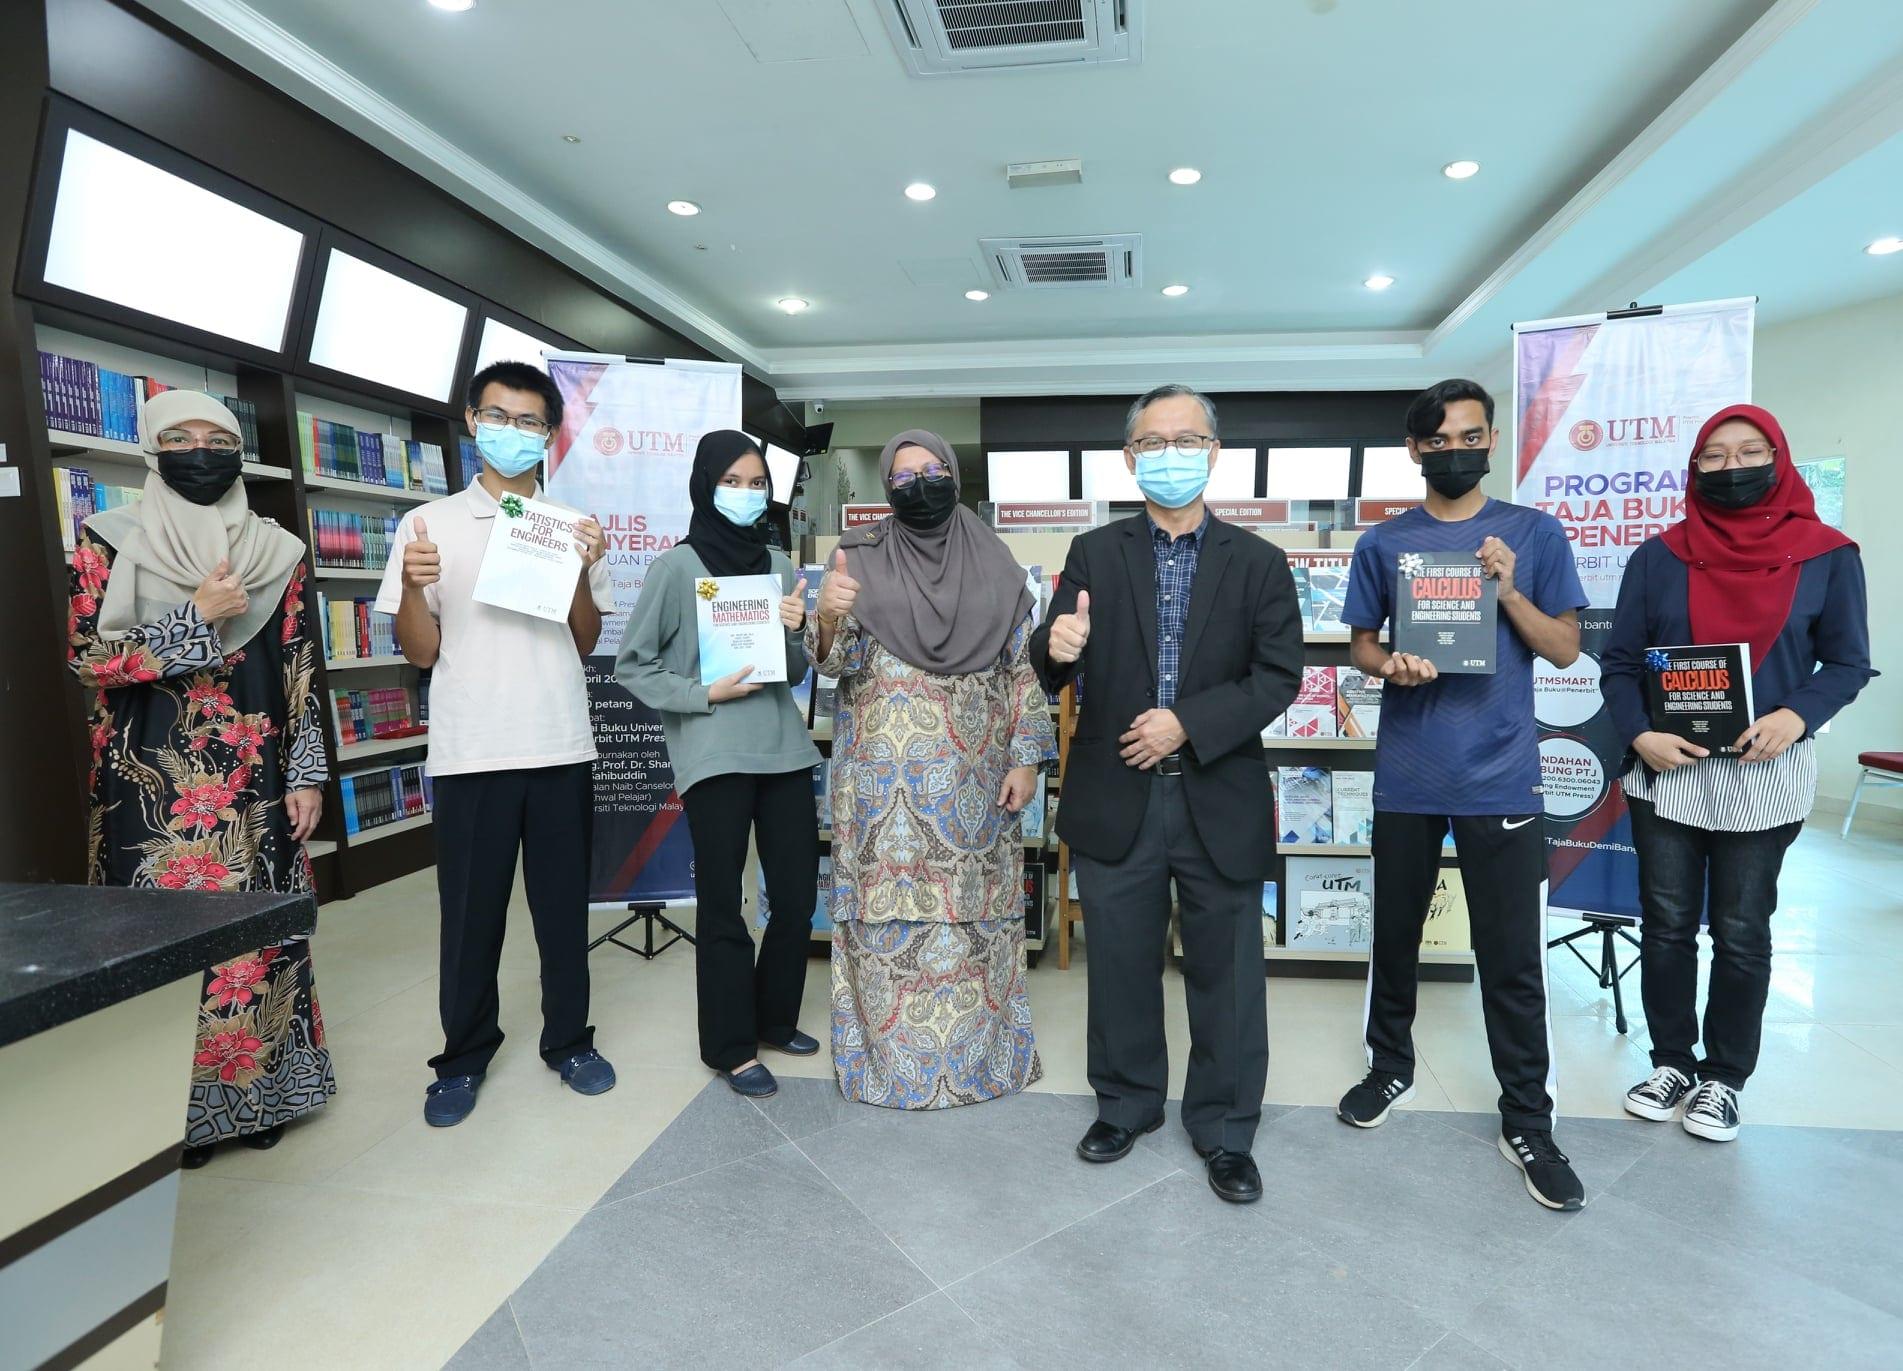 Program Taja Buku@Penerbit UTM beri manfaat kepada mahasiswa B40